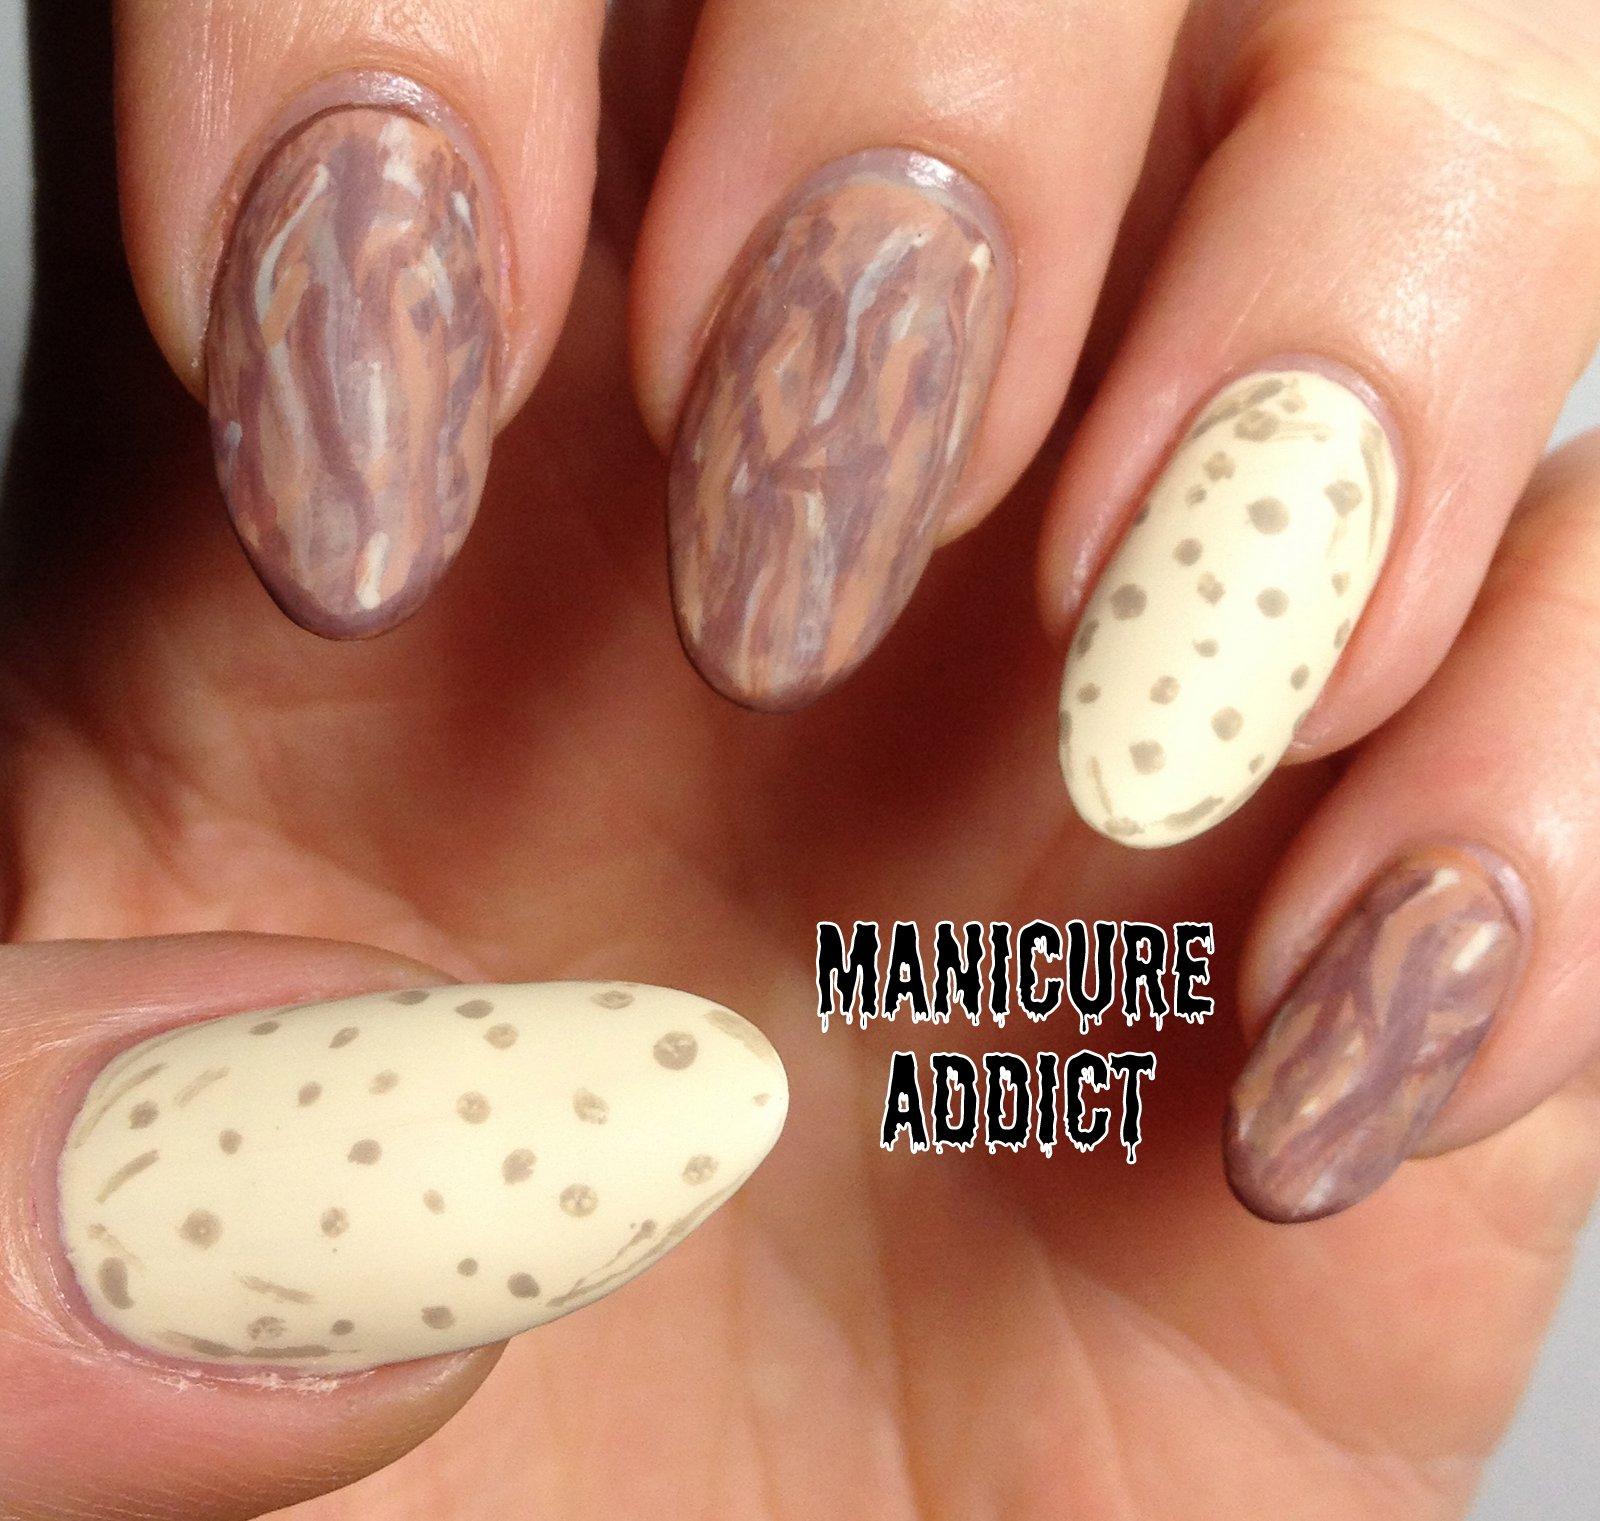 Manicure Addict: Almond Nail Art